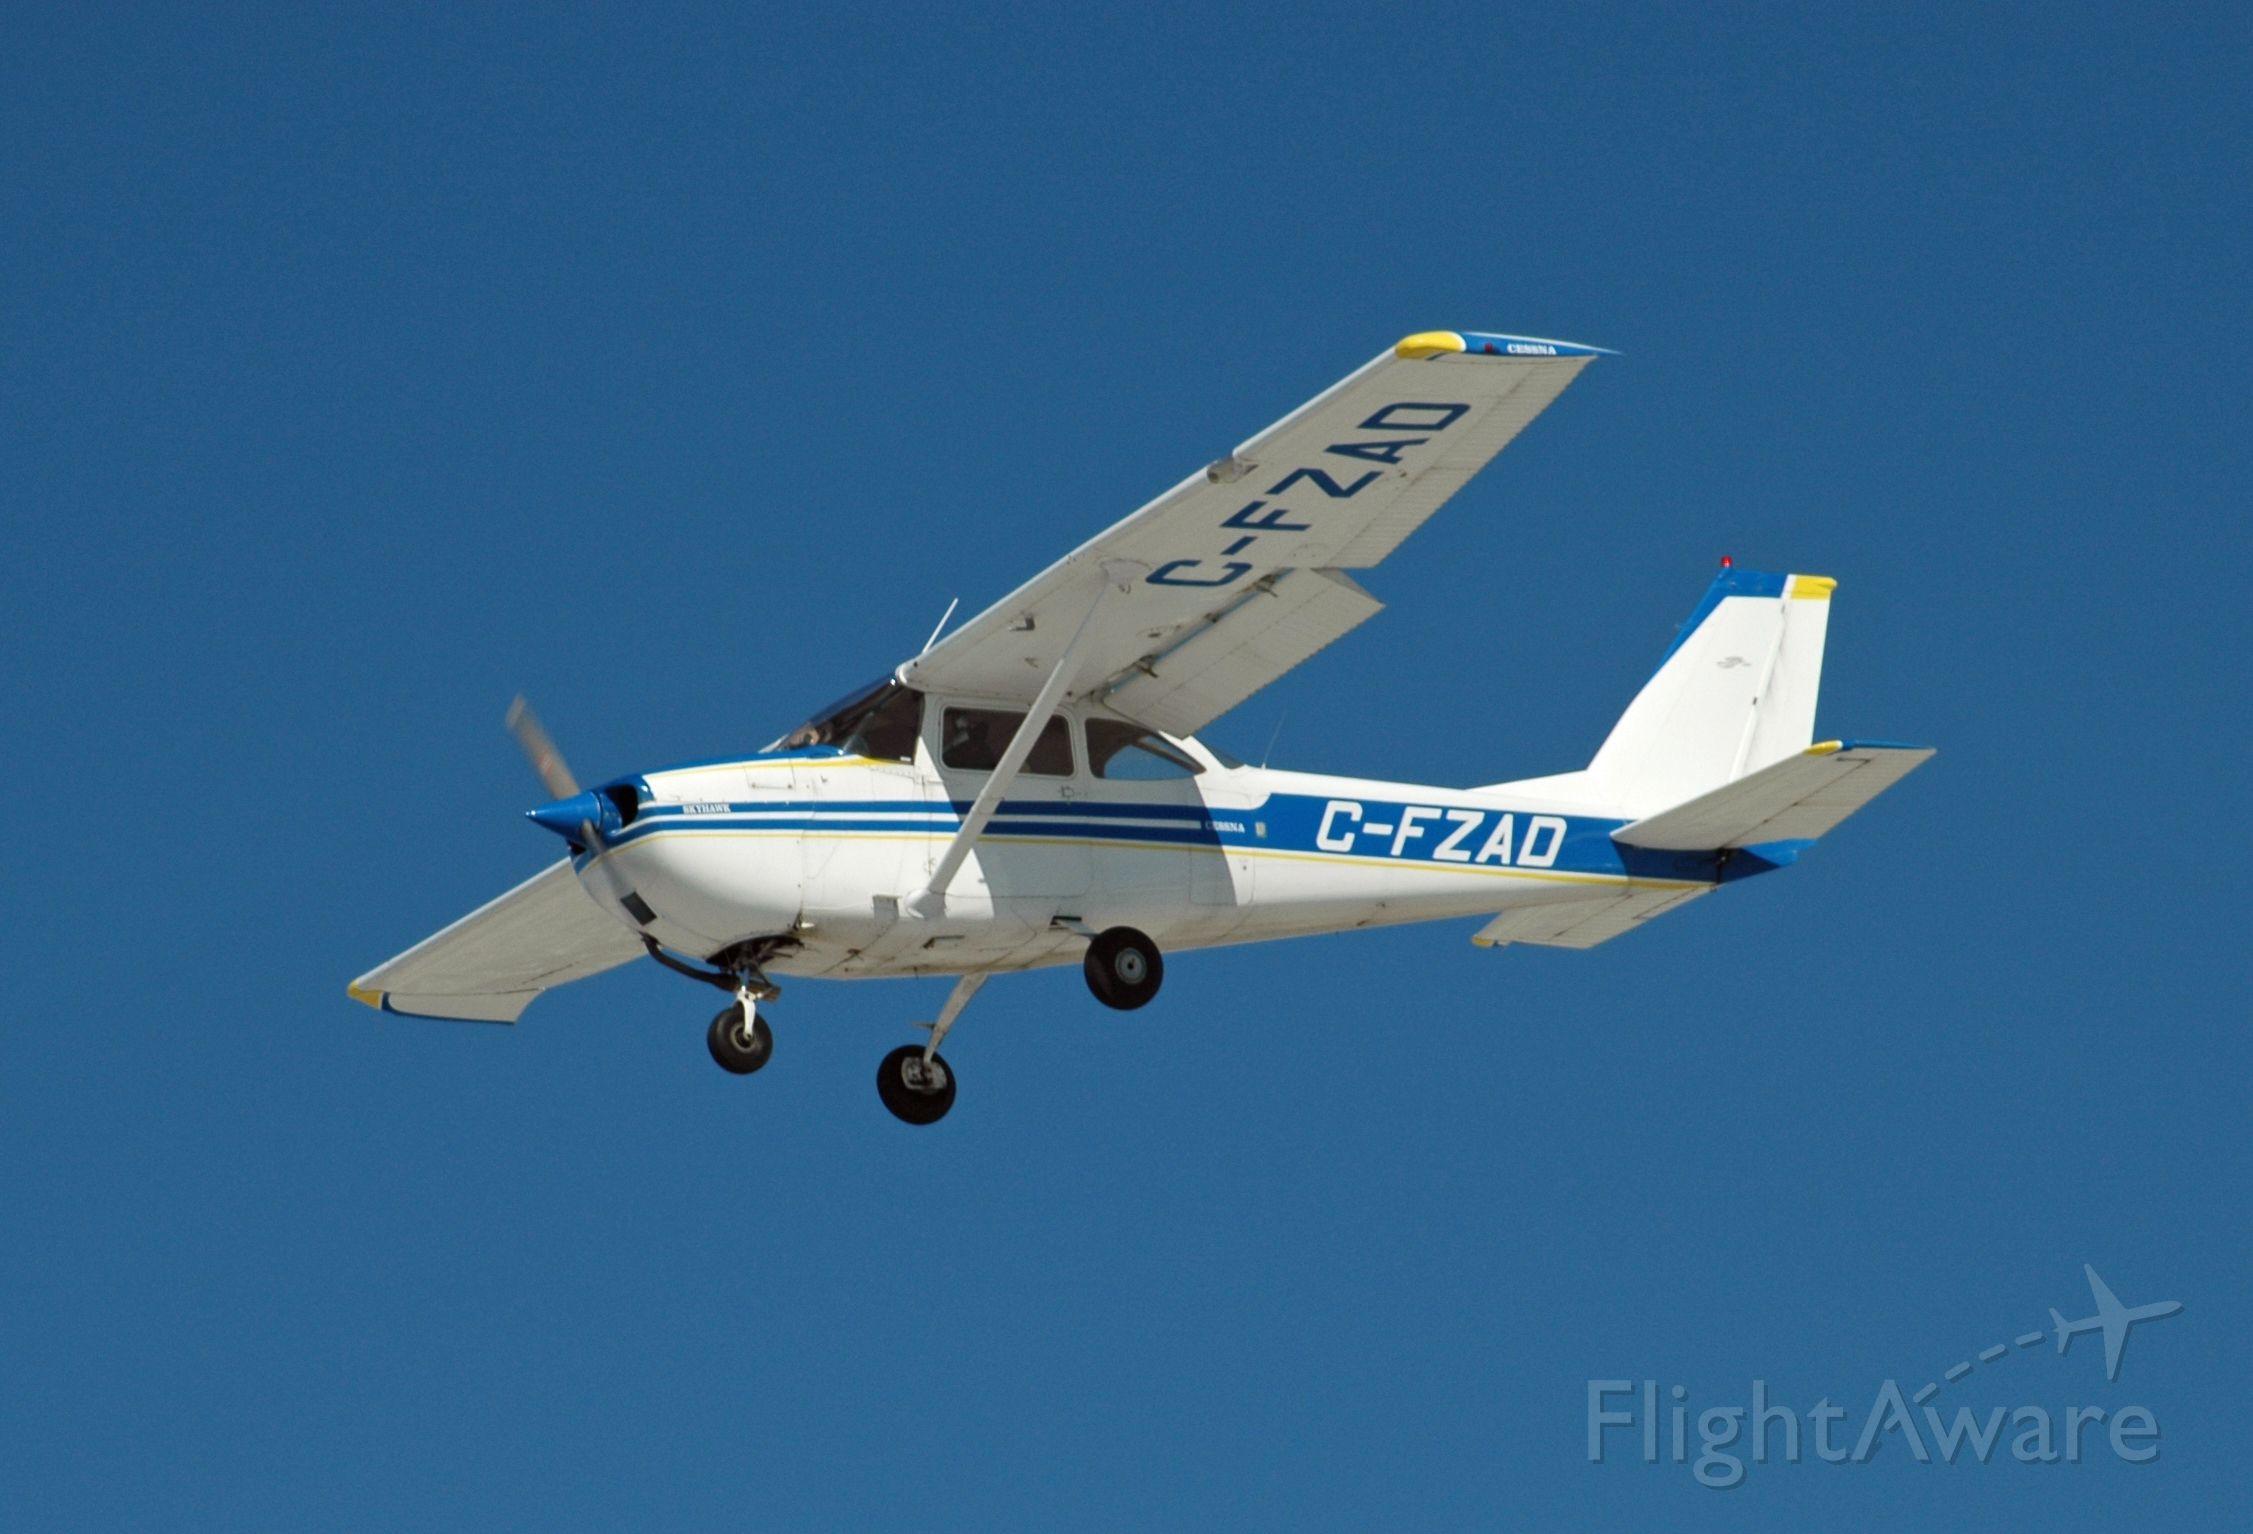 Cessna Skyhawk (C-FZAD) - 1968 Cessna 172I Skyhawk (C-FZAD/172-56696) on final approach at CYPQ on March 7, 2021